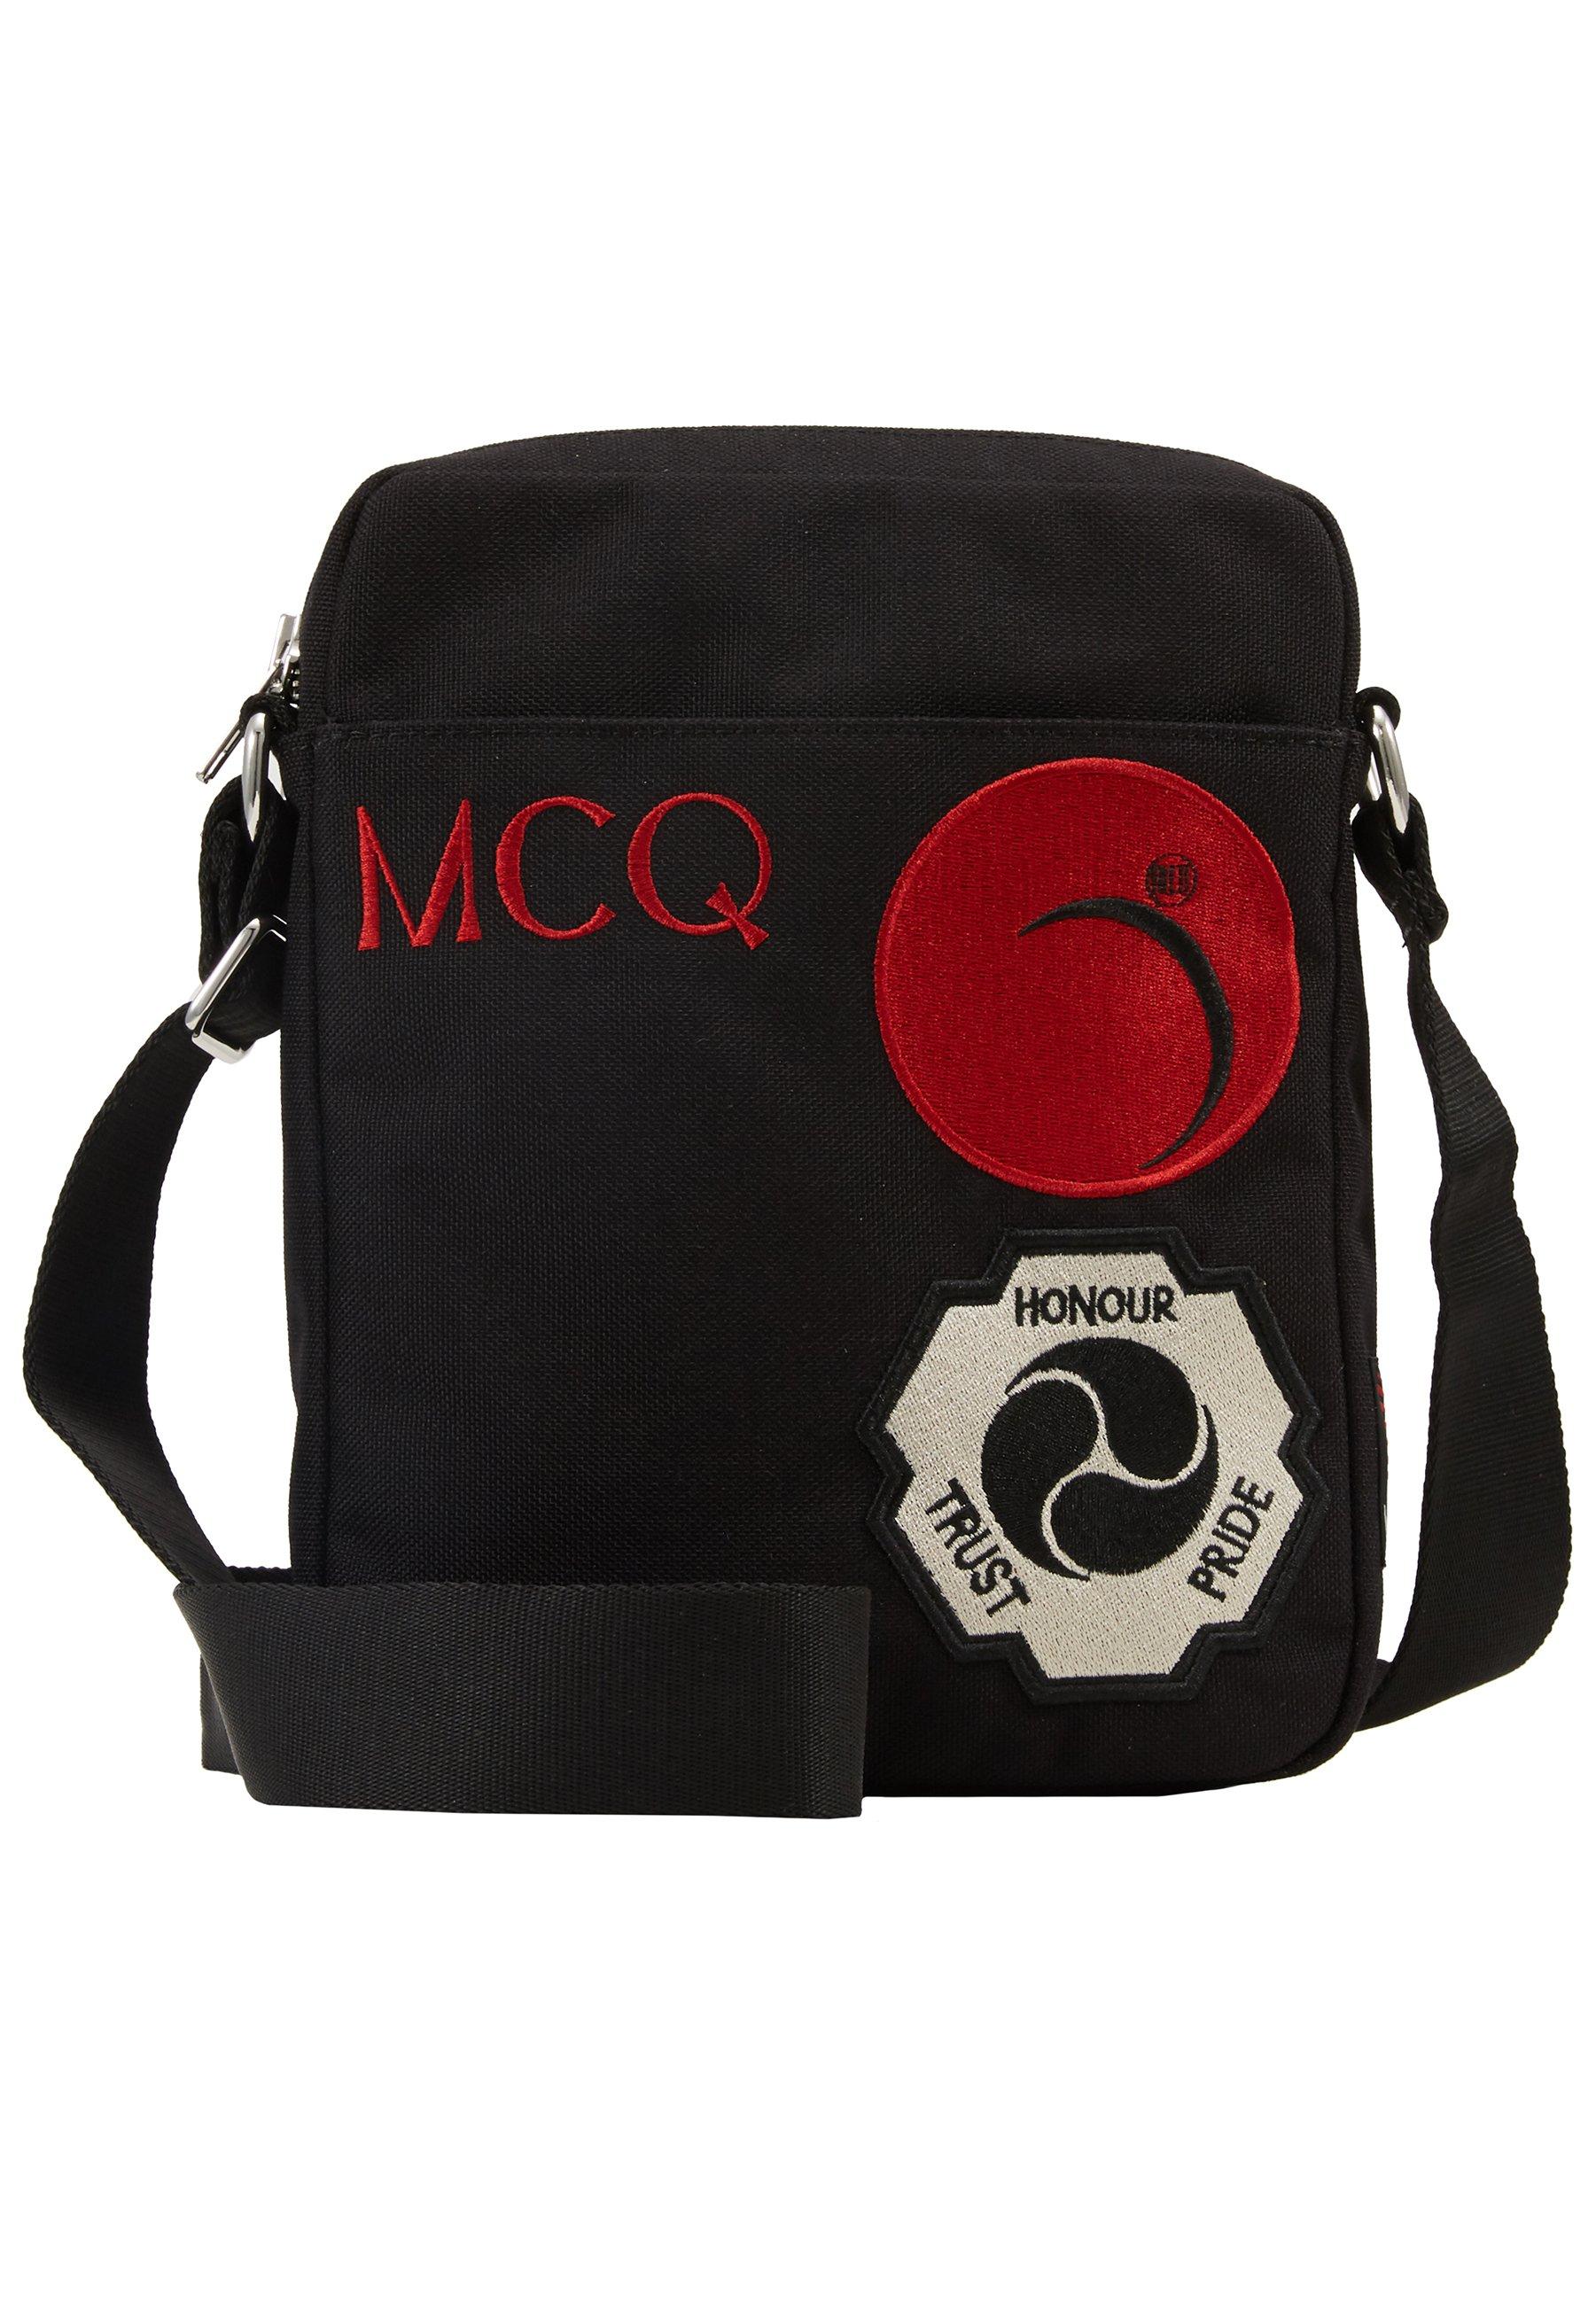 Mcq Alexander Mcqueen Heuptas - Black 2aWqokt